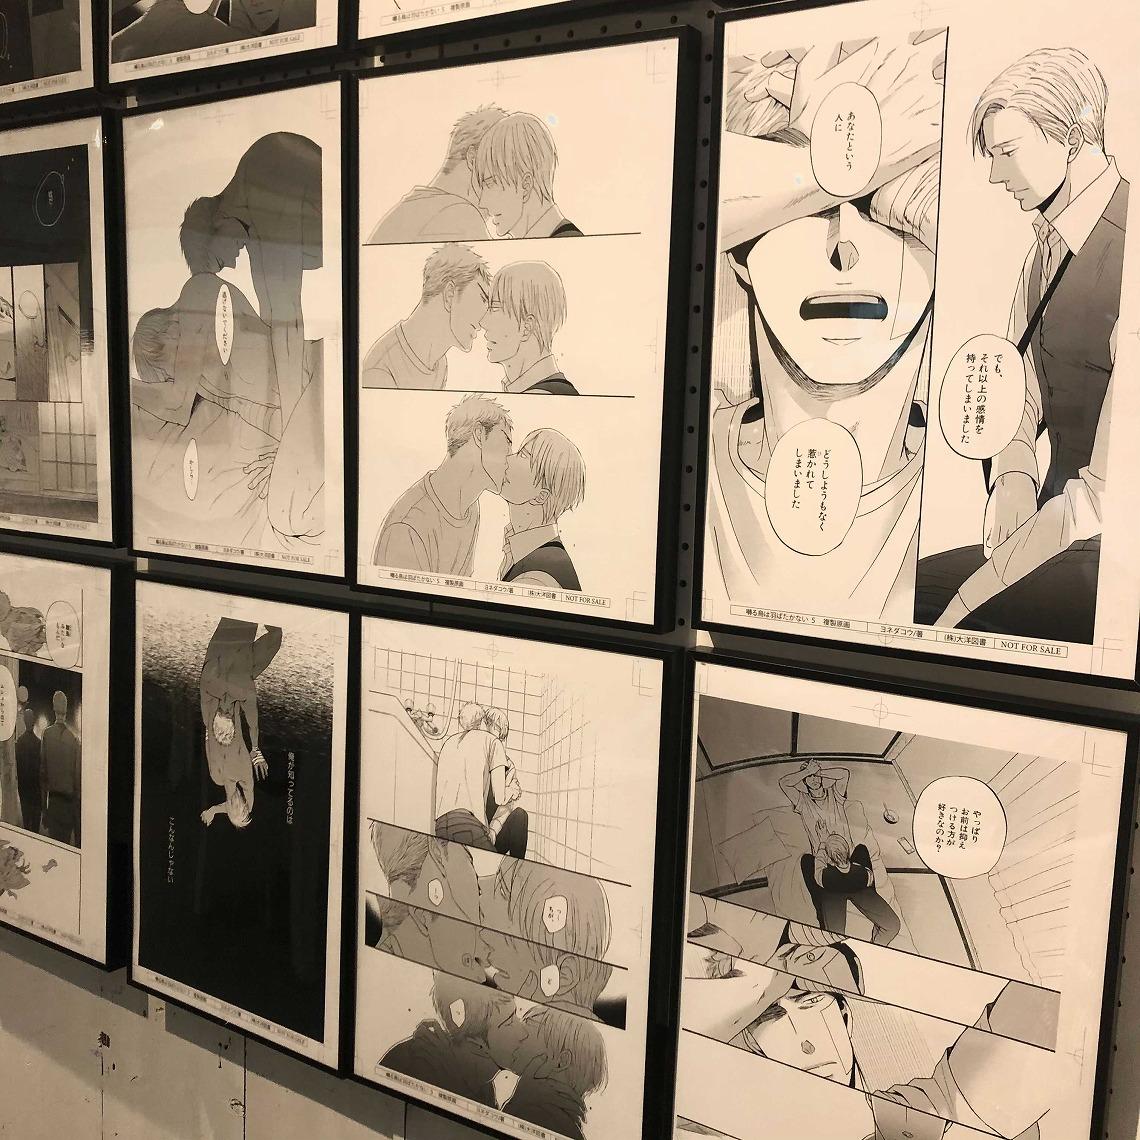 Guild ~囀る鳥は羽ばたかない コラボカフェ&複製原画展 at TORICO~